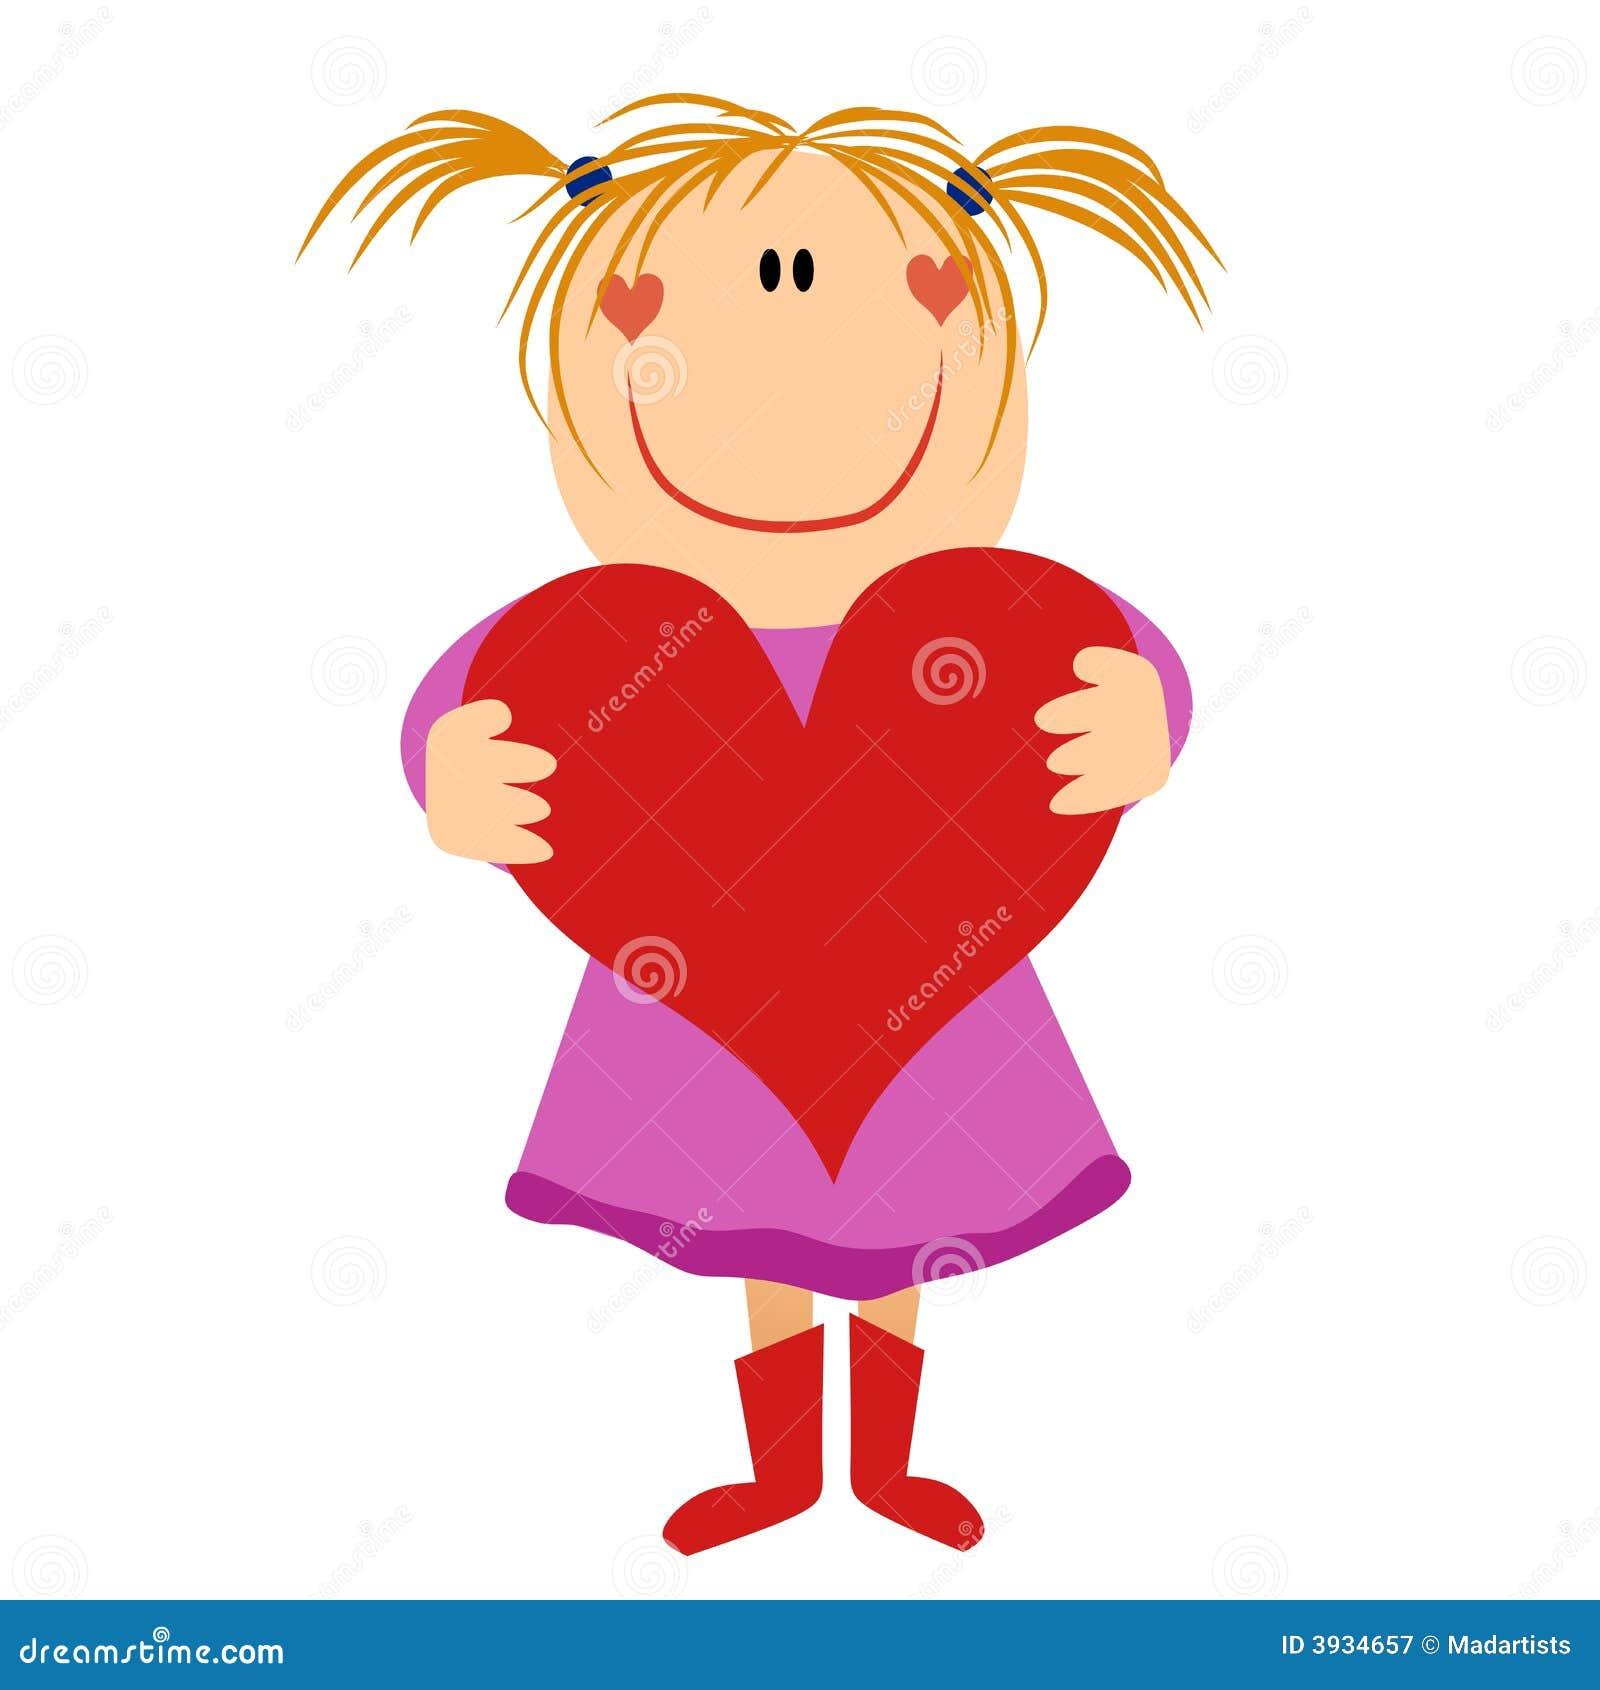 Cartoonish Little Girl Holding Valentine Heart